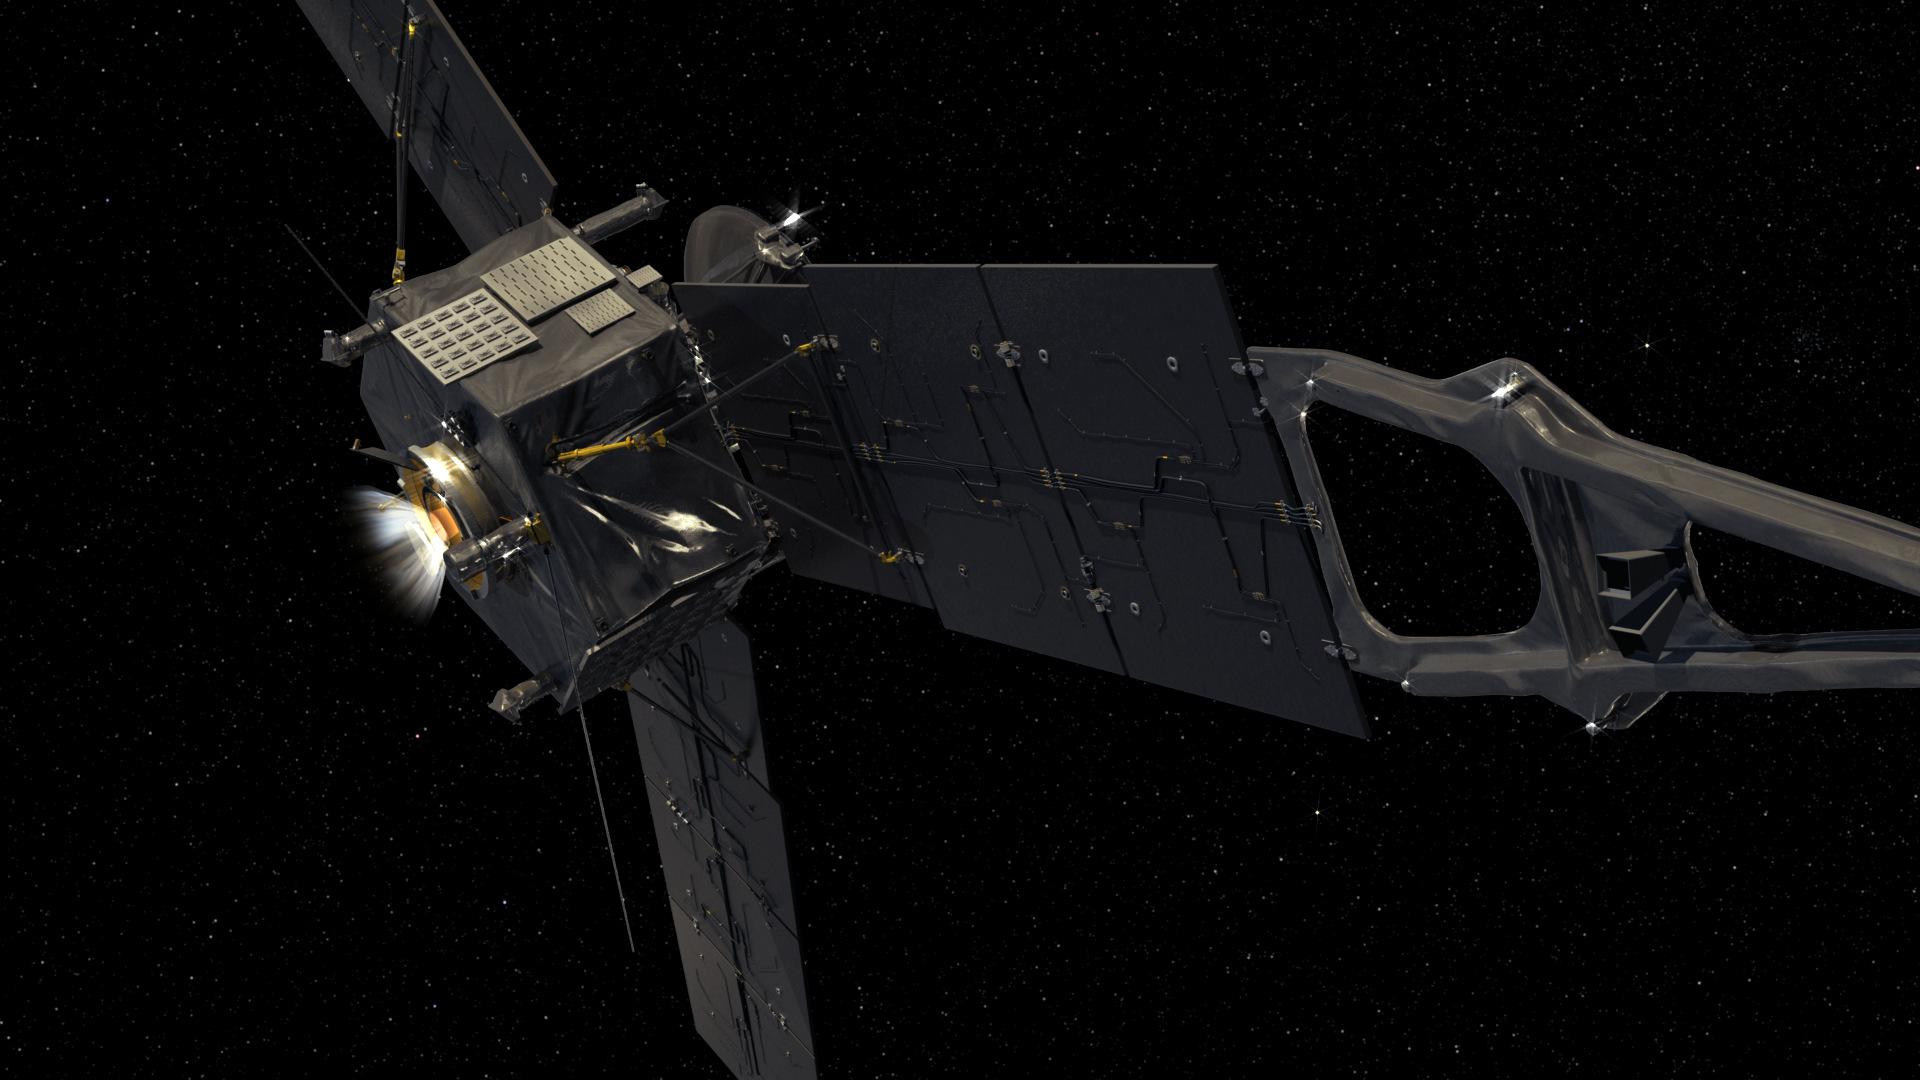 juno mission trajectory design juno image nasa jpl caltech